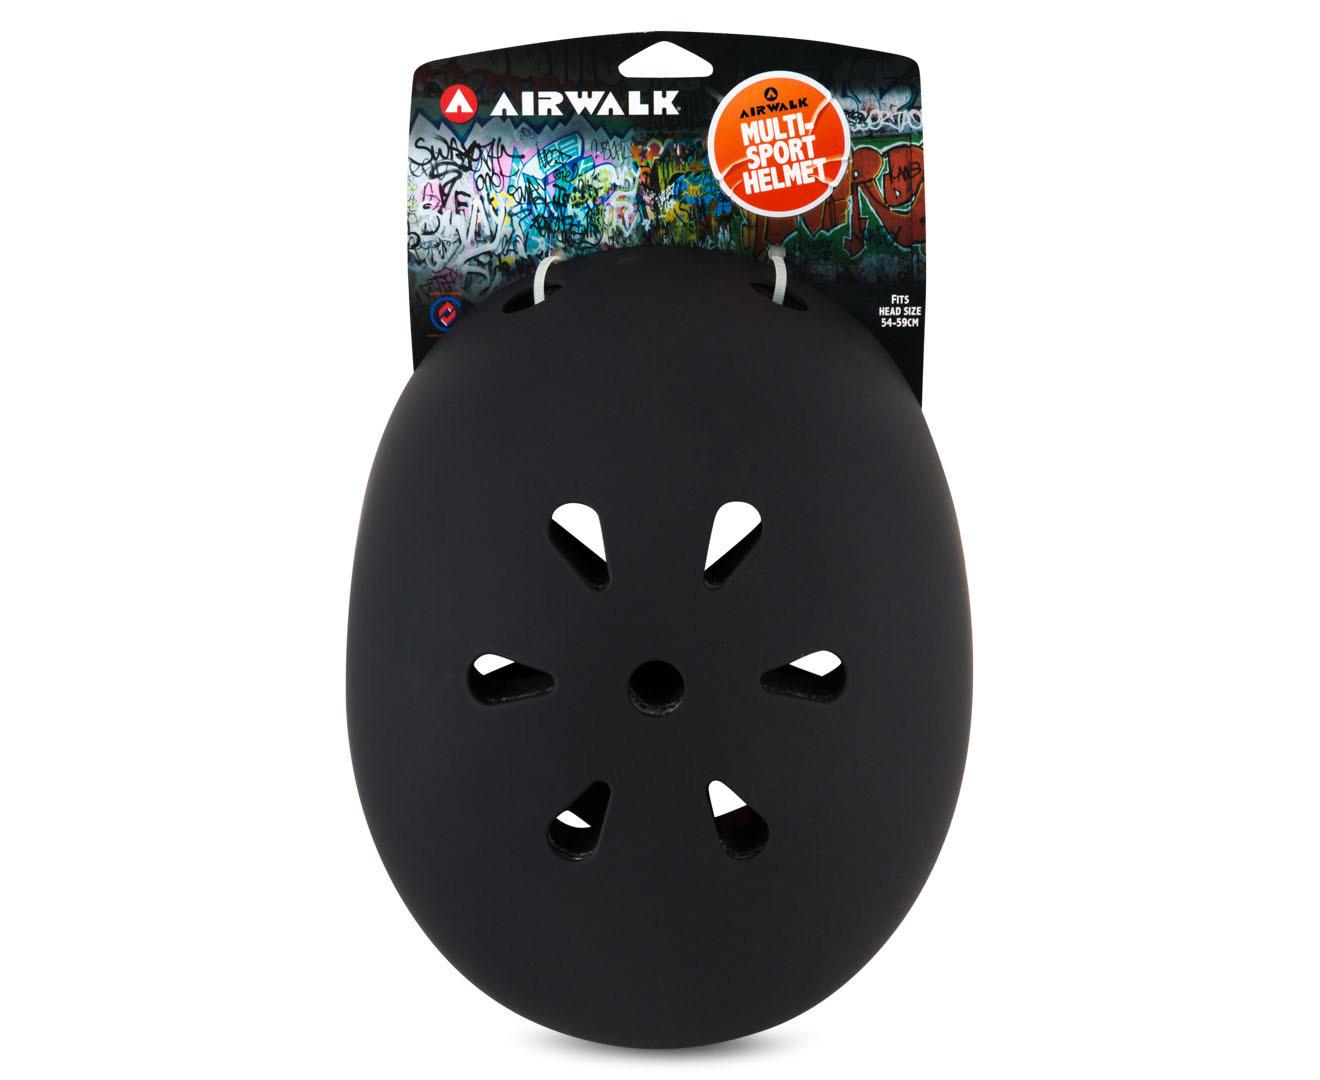 Airwalk Skate Helmet Medium - Black/Green